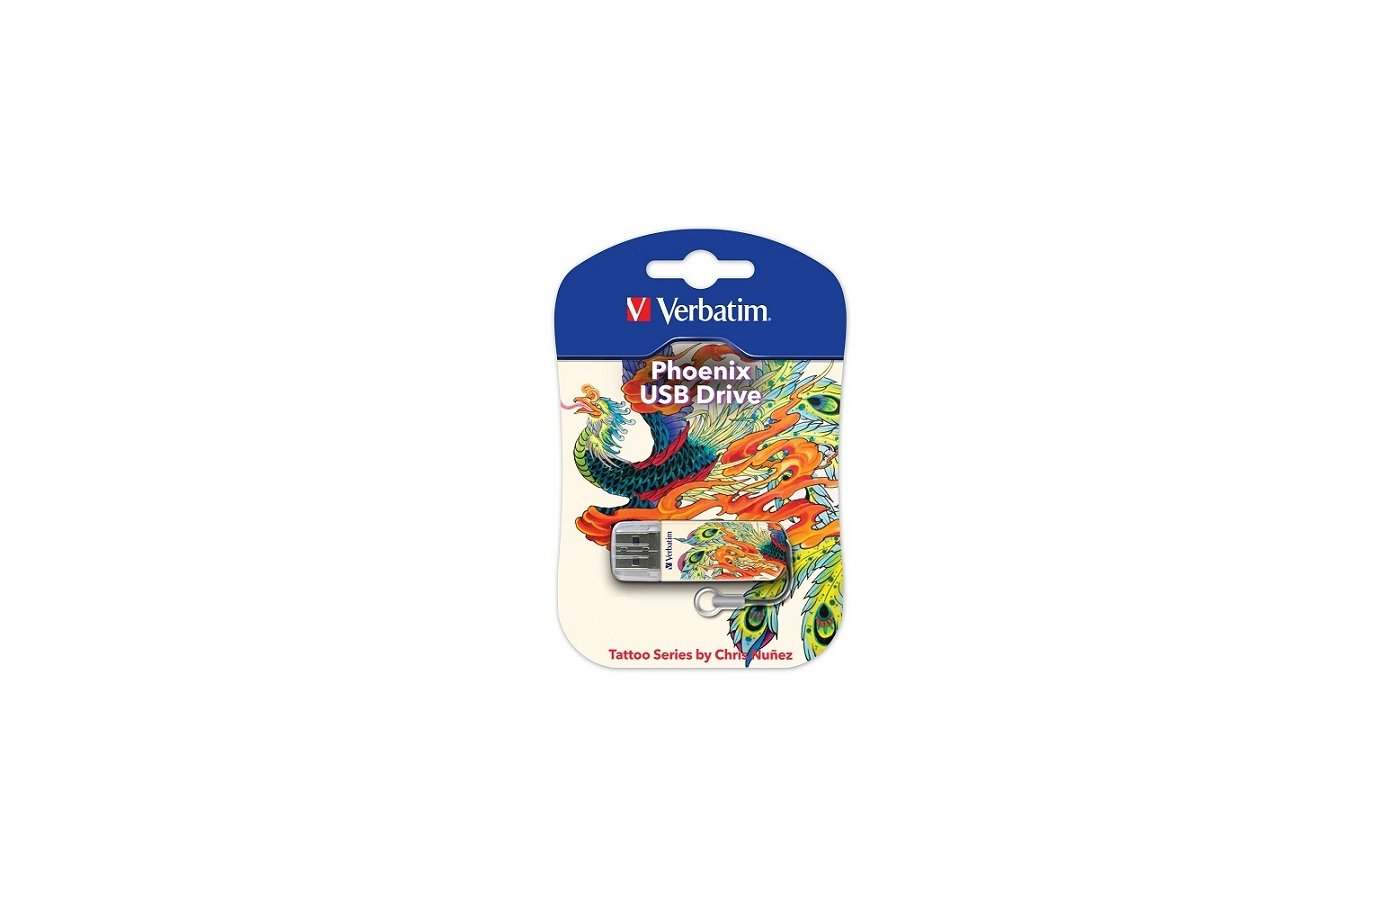 Флеш-диск Verbatim 16Gb Store n Go Mini TATTOO EDITION PHOENIX 49887 USB2.0 белый/узор